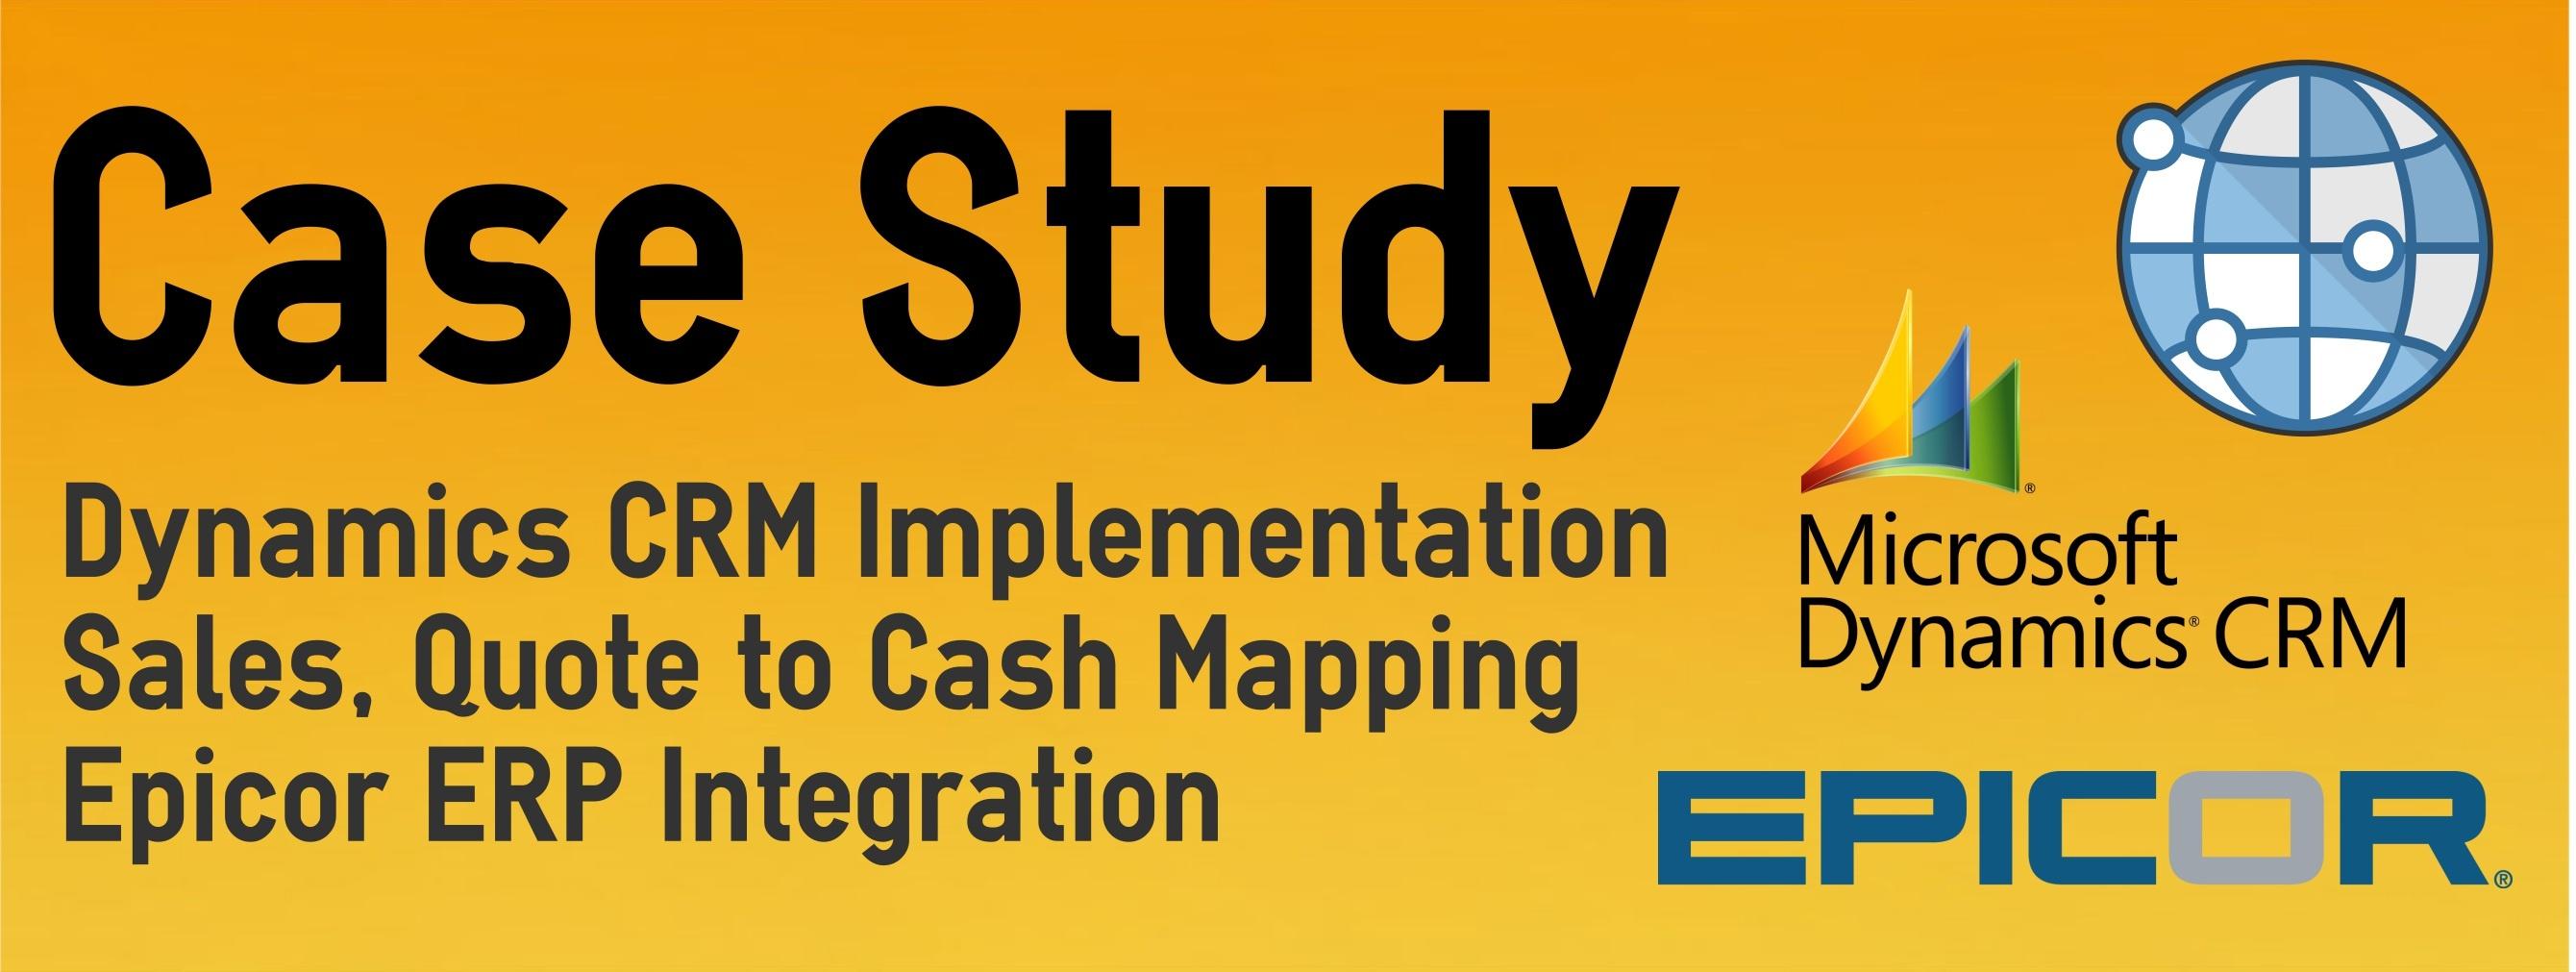 dynamics crm implementation case study